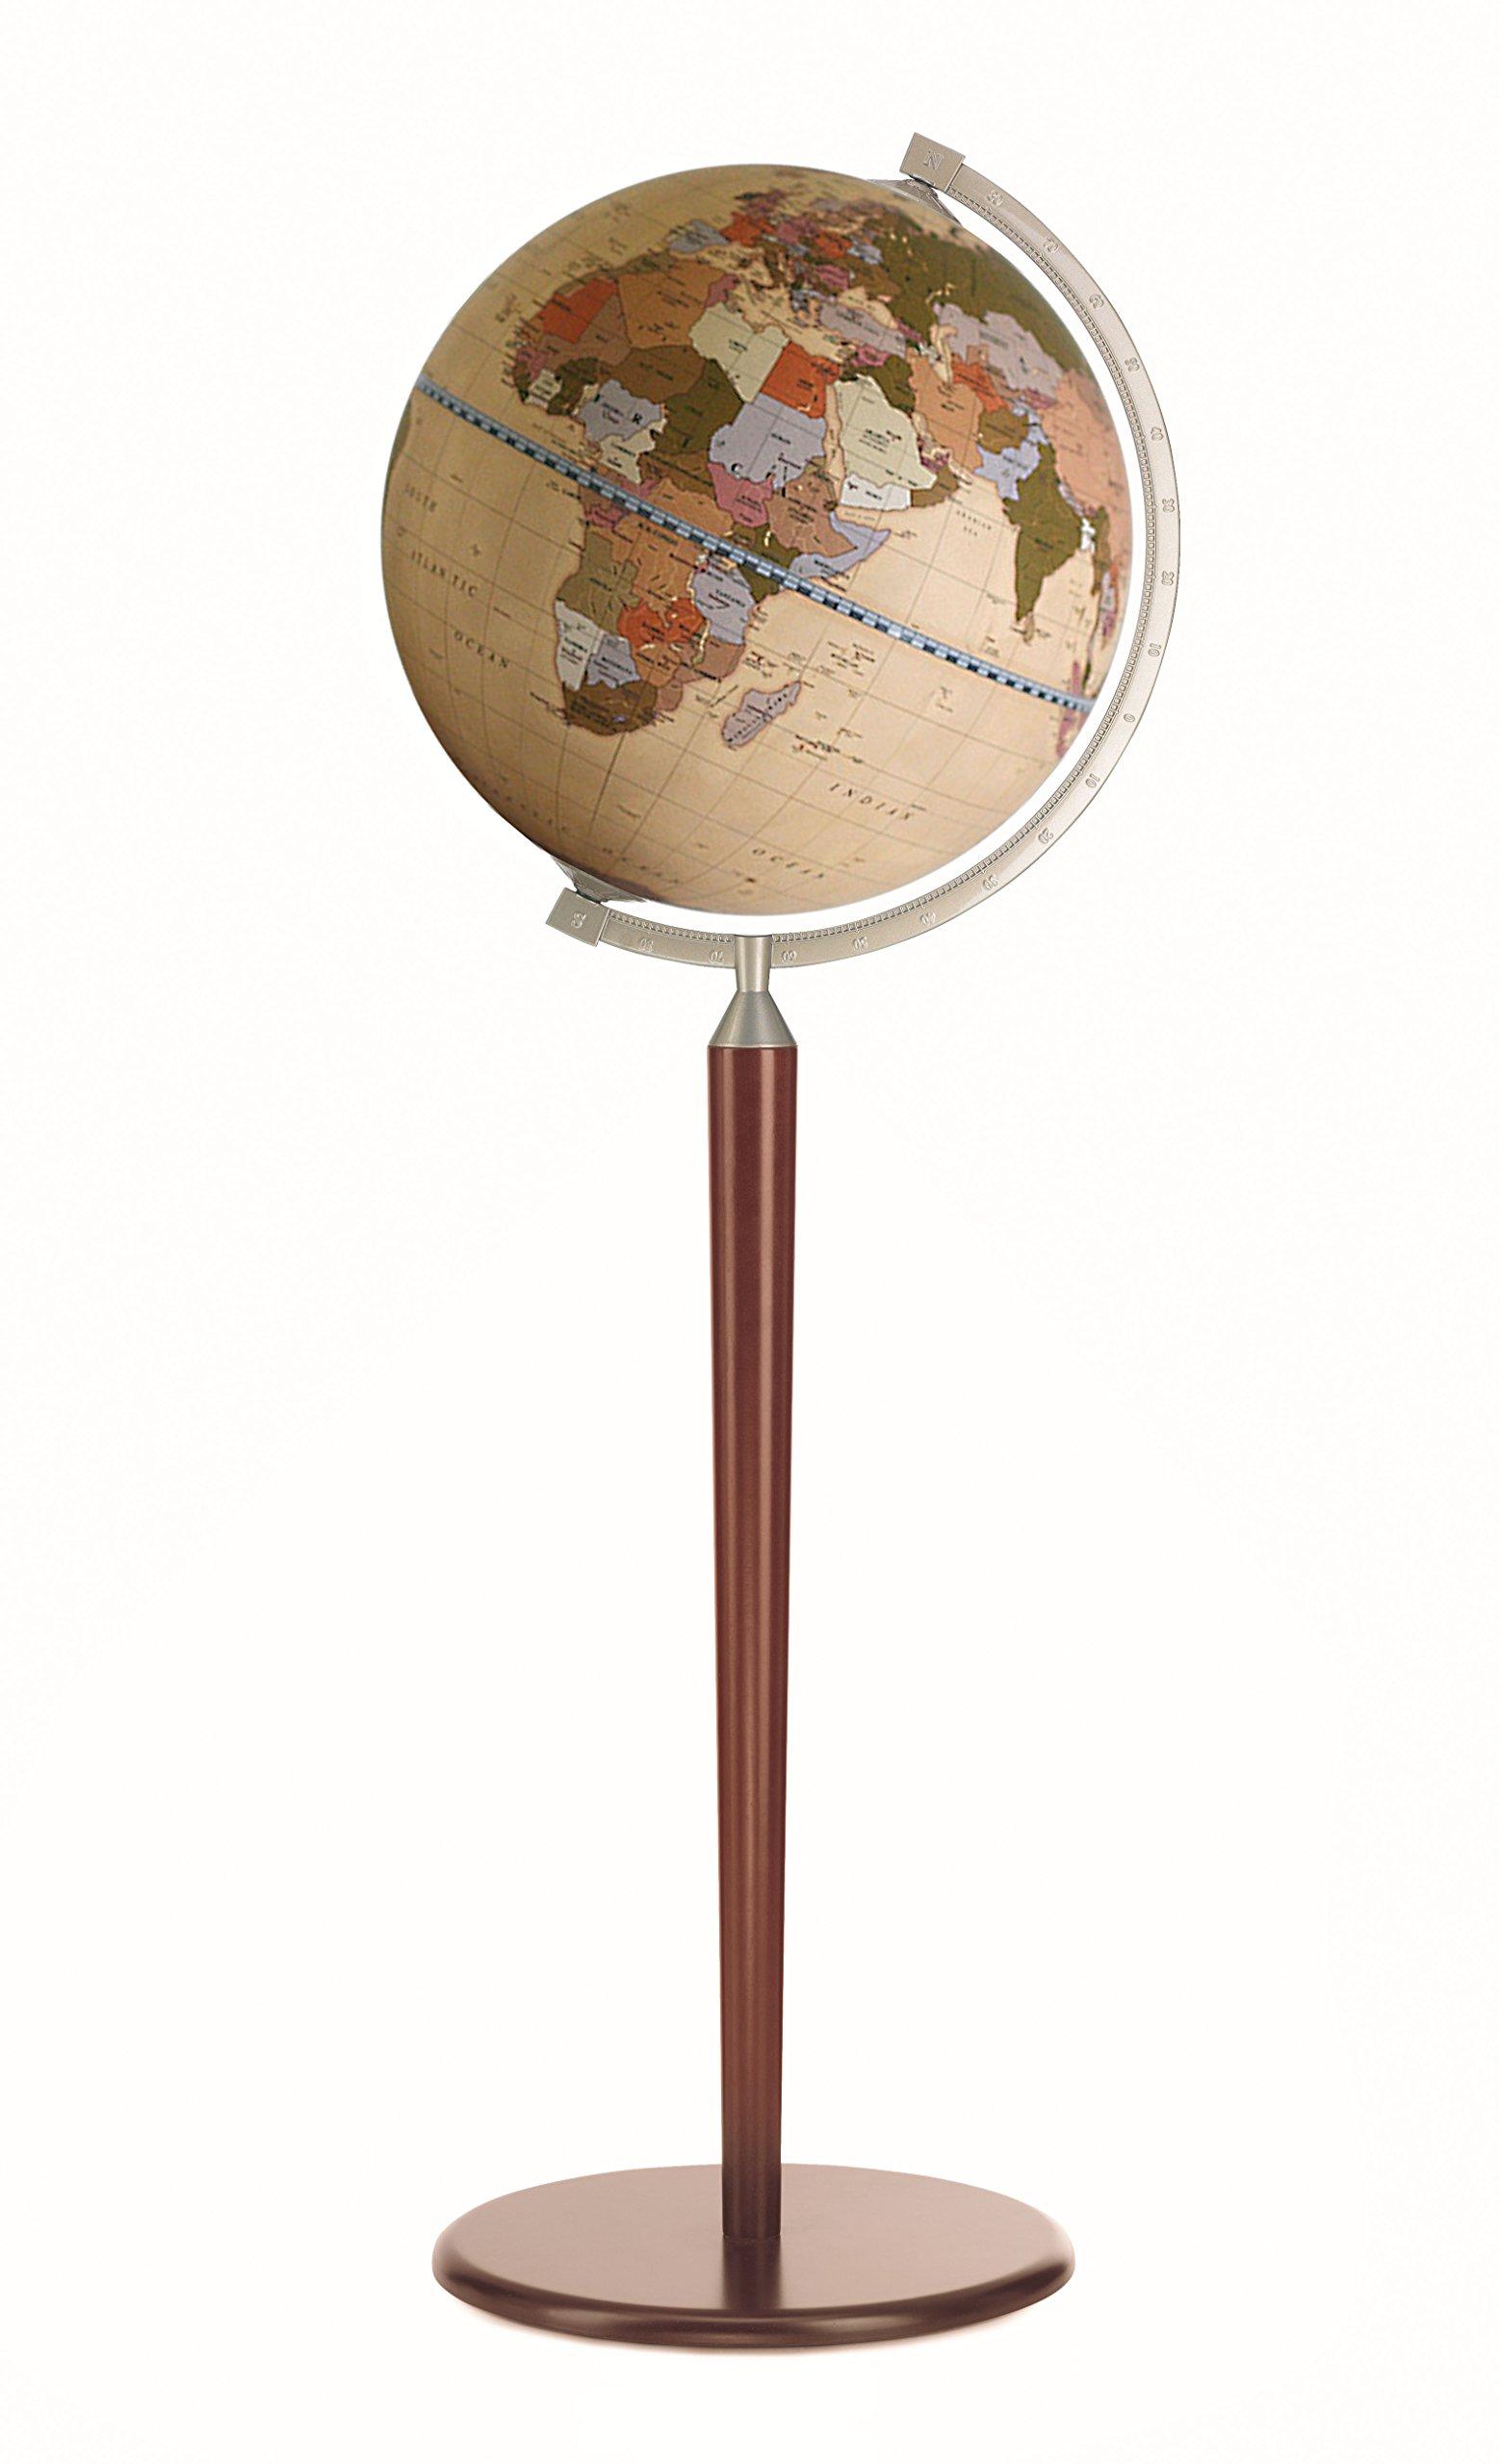 Zoffoli 16'' Vasco da Gama Floor Globe (Dark Stand with Apricot Ocean)